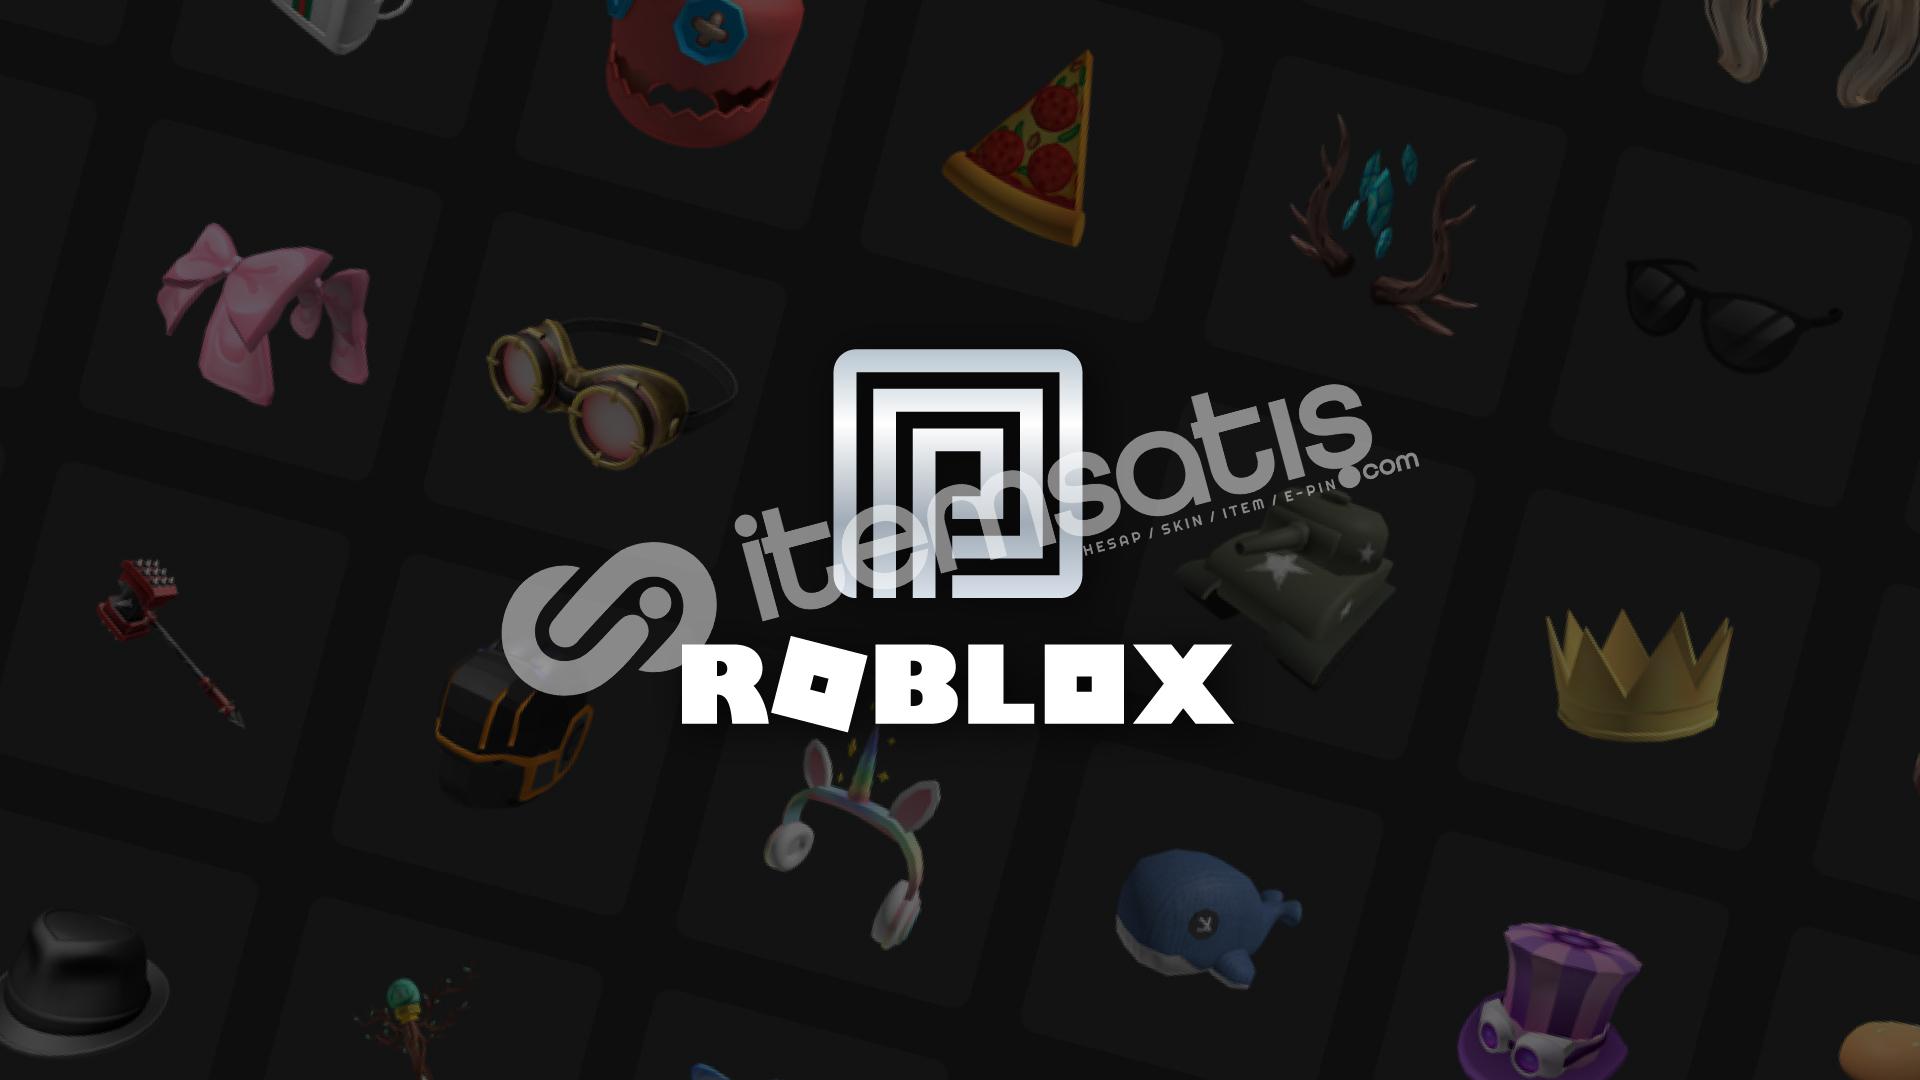 Roblox 80 Robux (İndirimli)